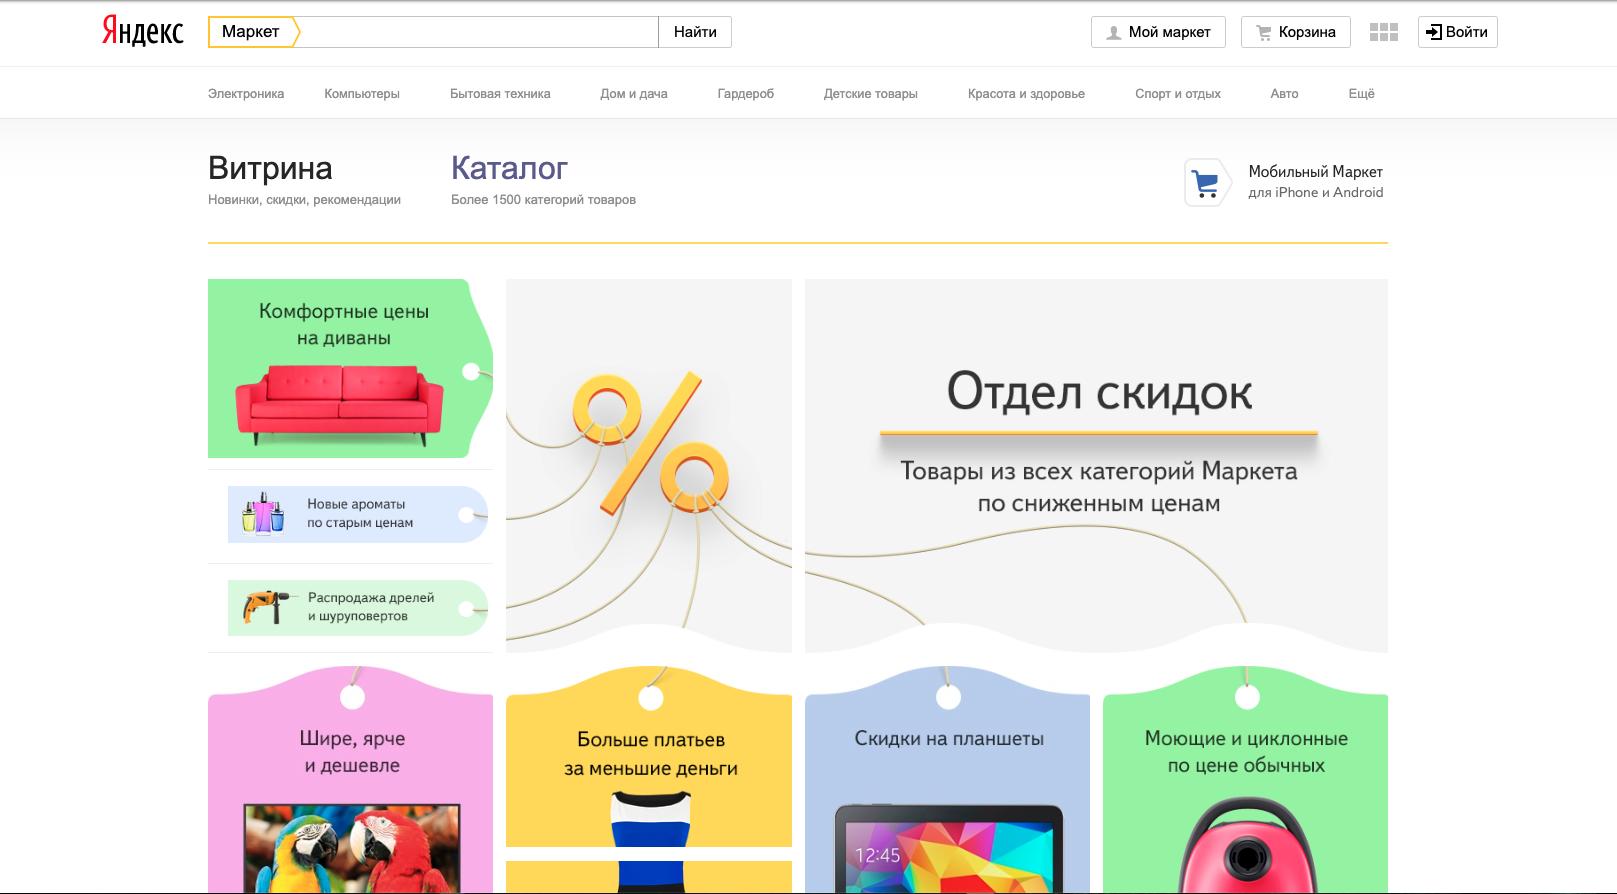 Главная страница Яндекс Маркет 2015 год